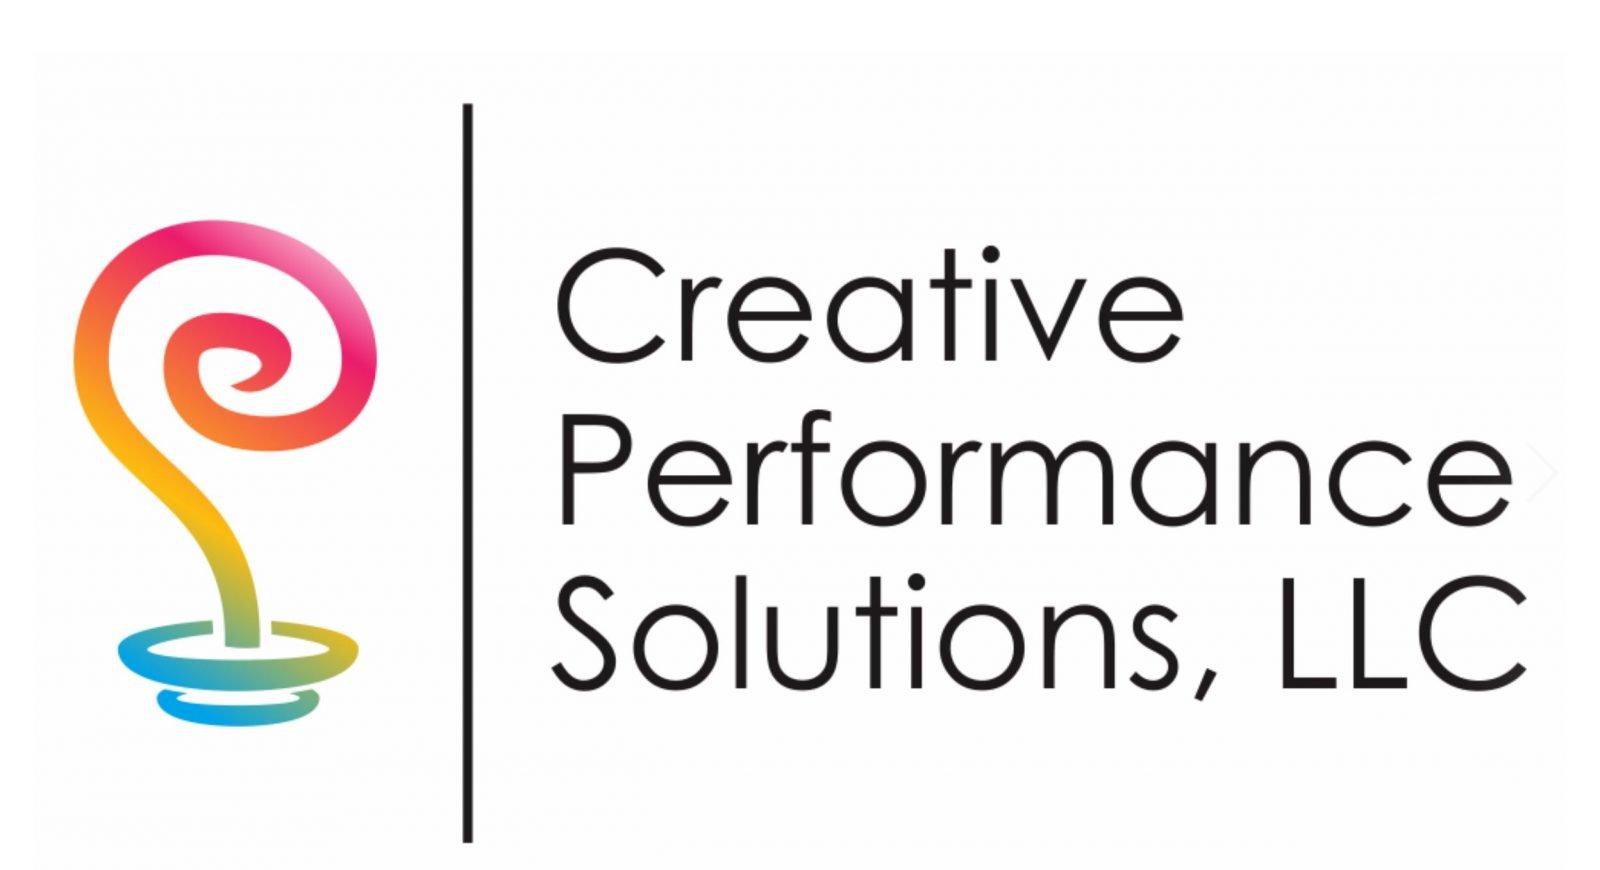 Creative Performance Solutions LLC